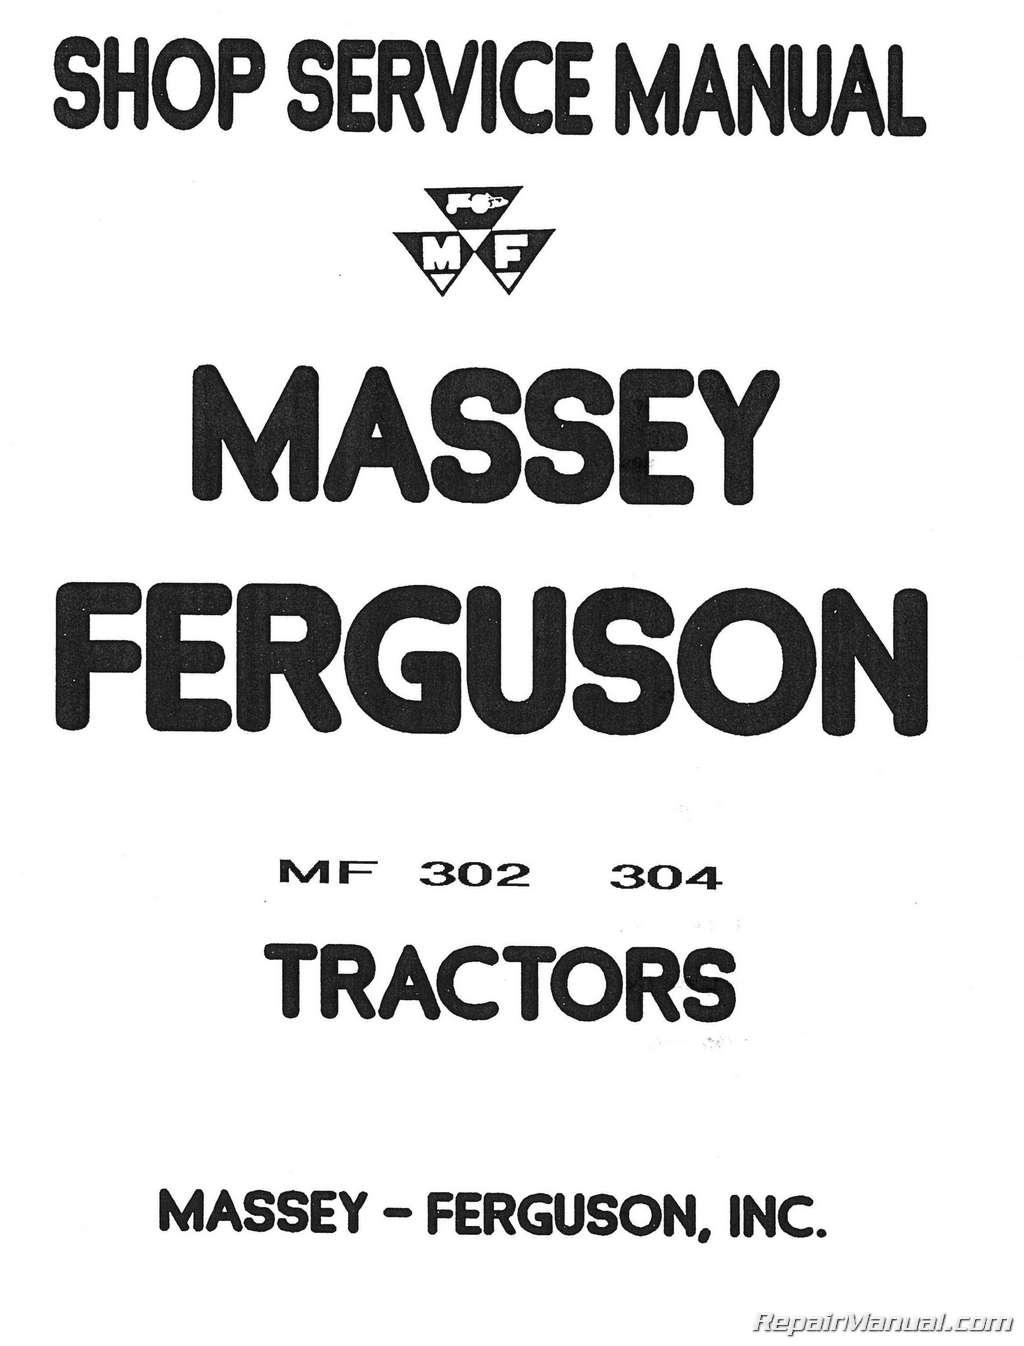 hight resolution of massey ferguson mf 302 mf 304 tractor mf 320 backhoe service manual rh repairmanual com massey